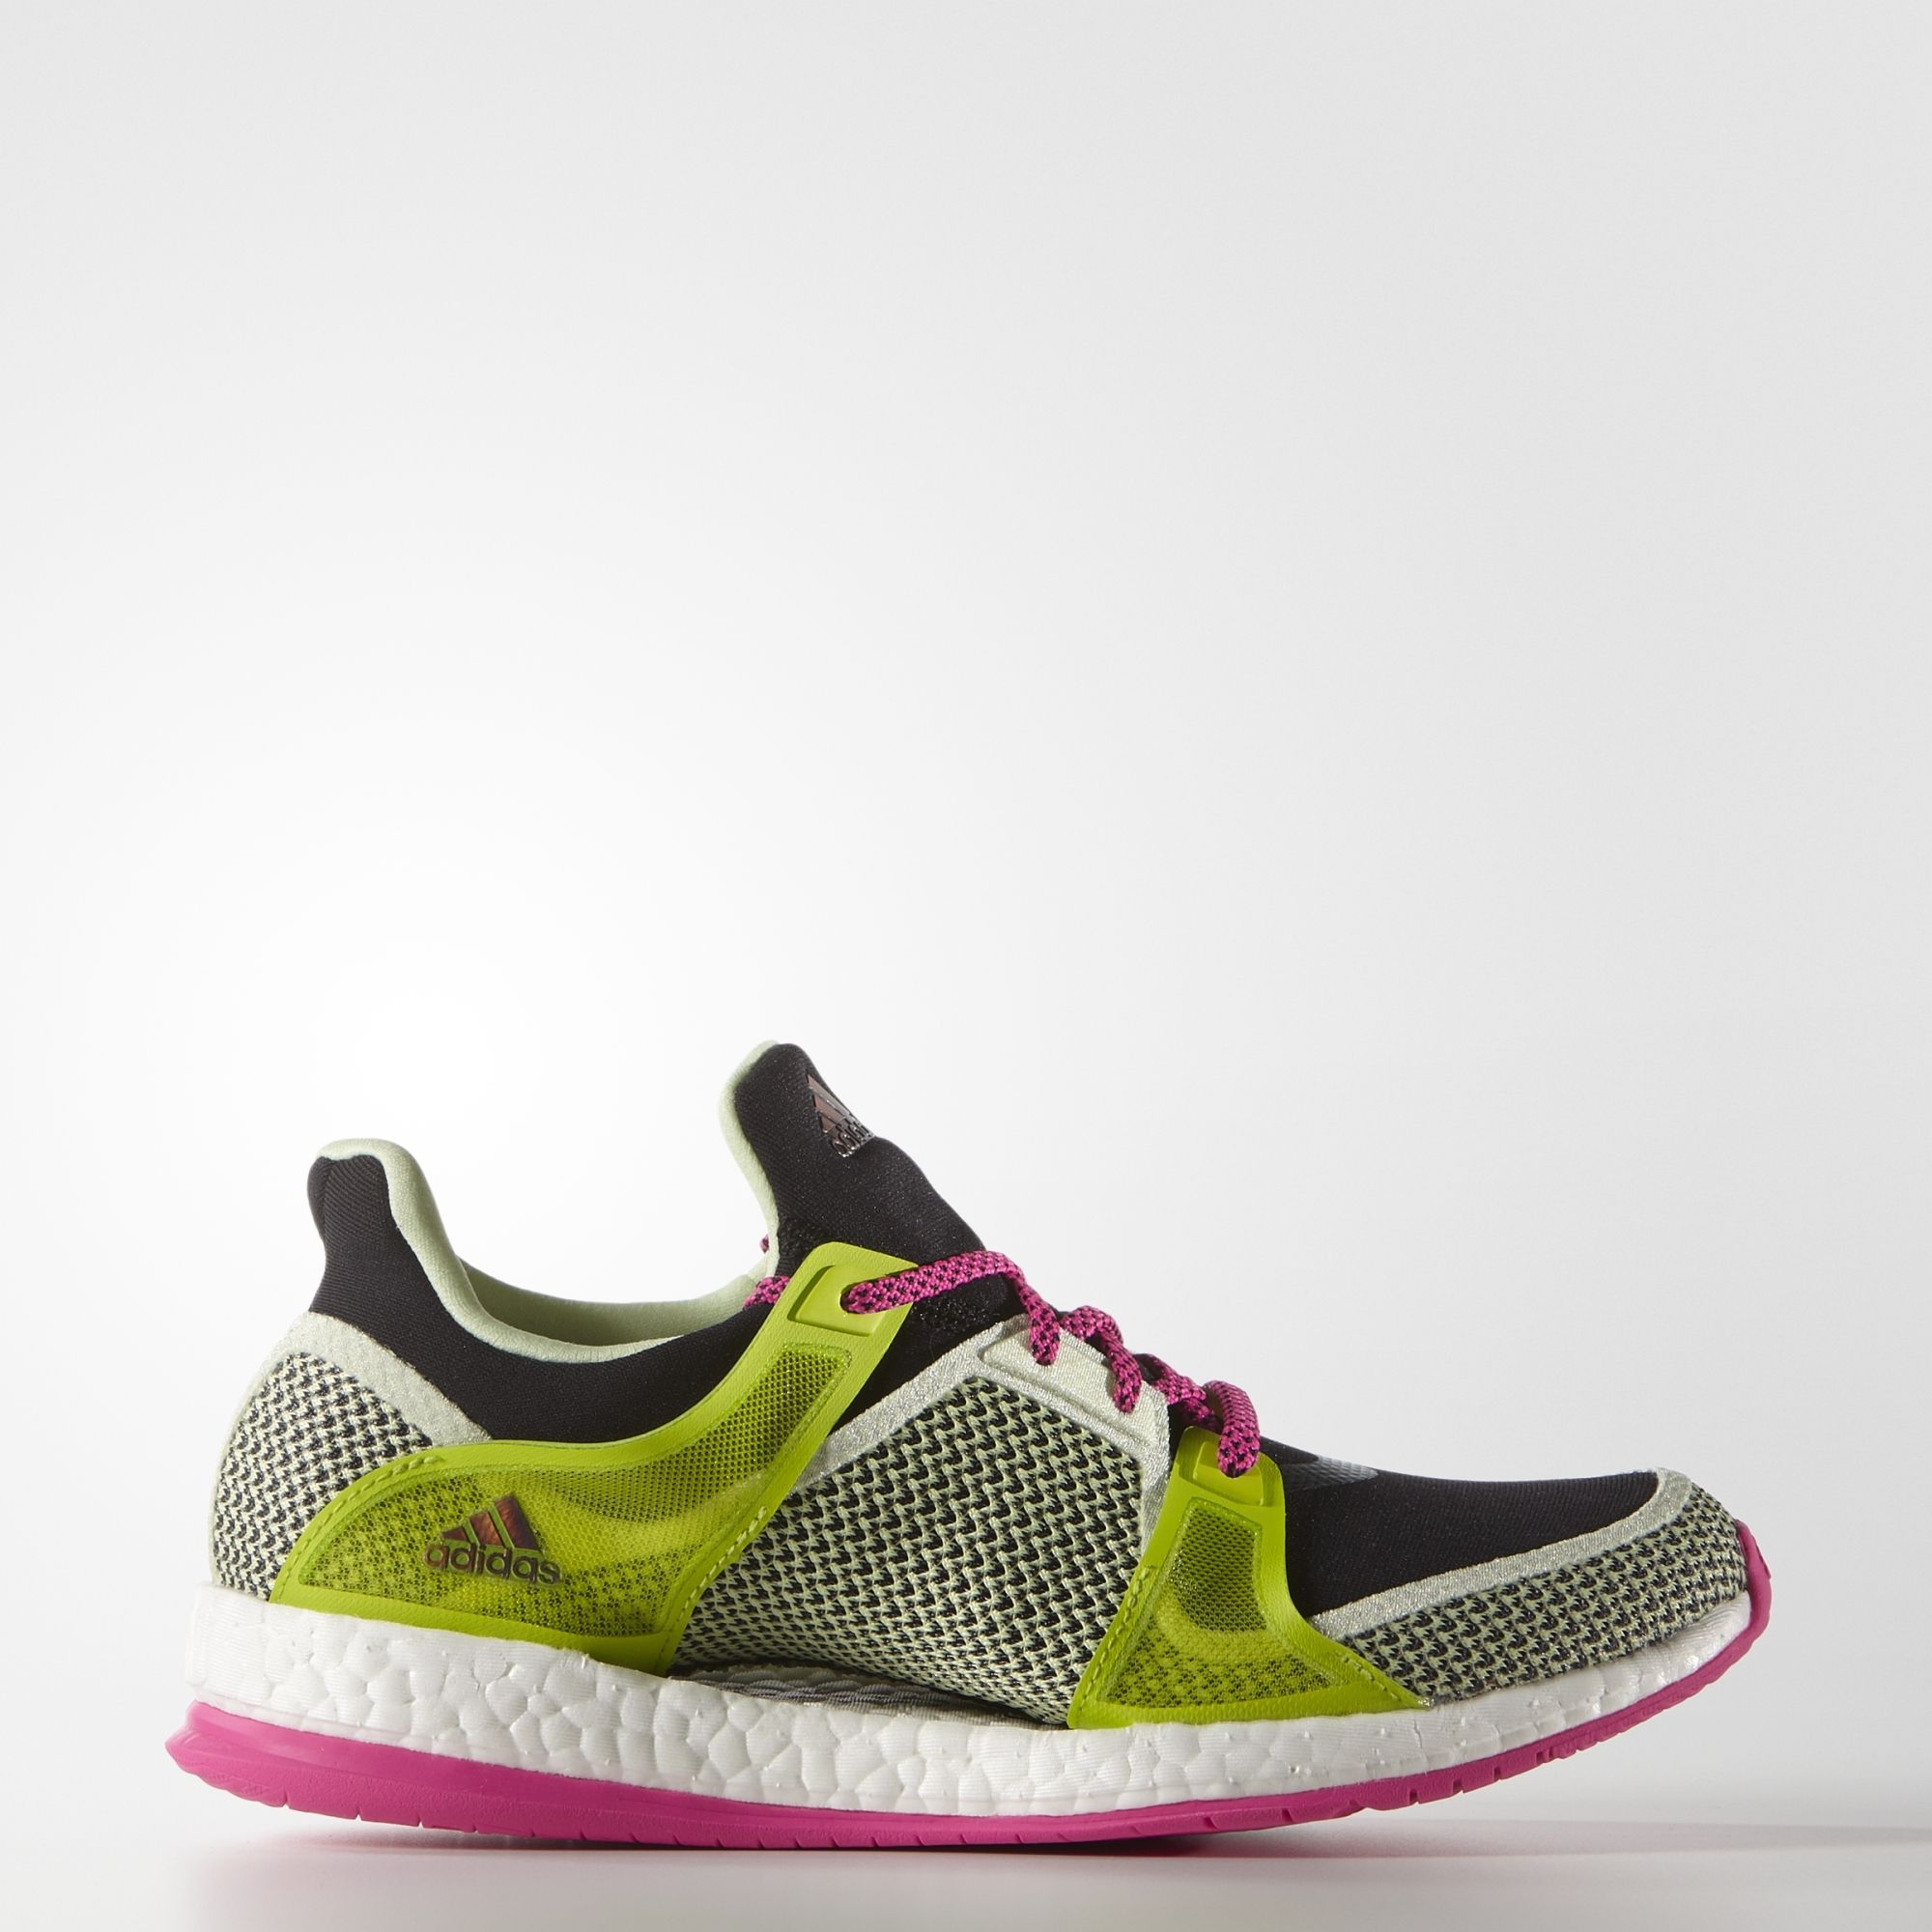 Pure Boost X Training Shoes | Adidas shoes women, Womens training ...